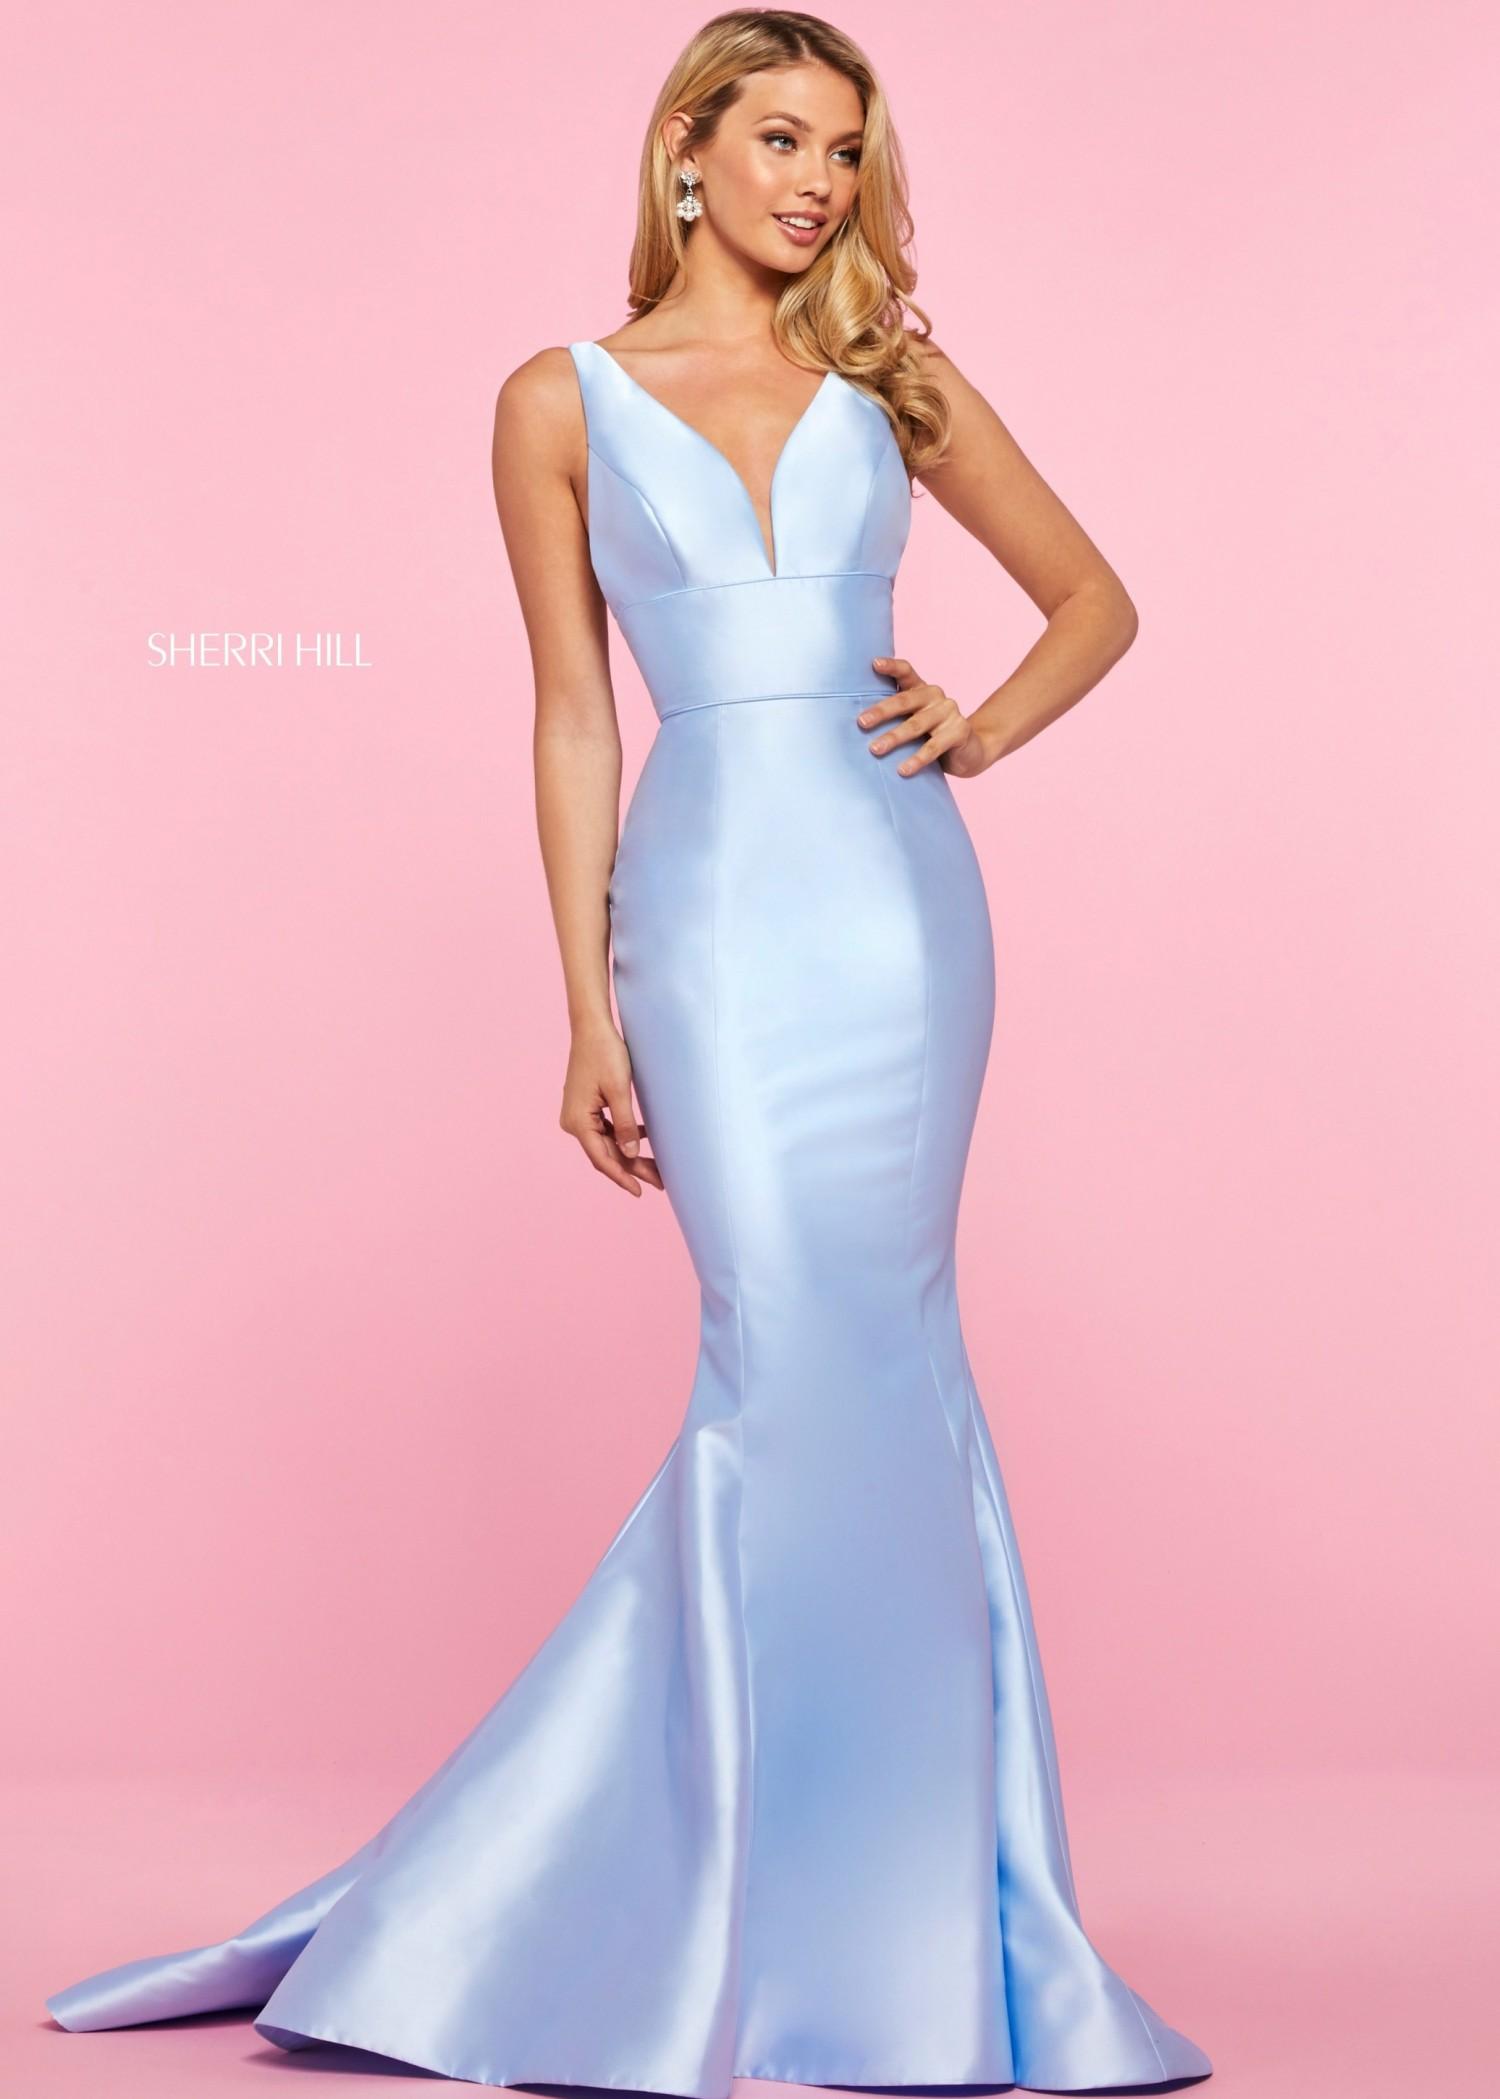 Sherri Hill 53660 Light Blue Mikado Mermaid Gown Size 4